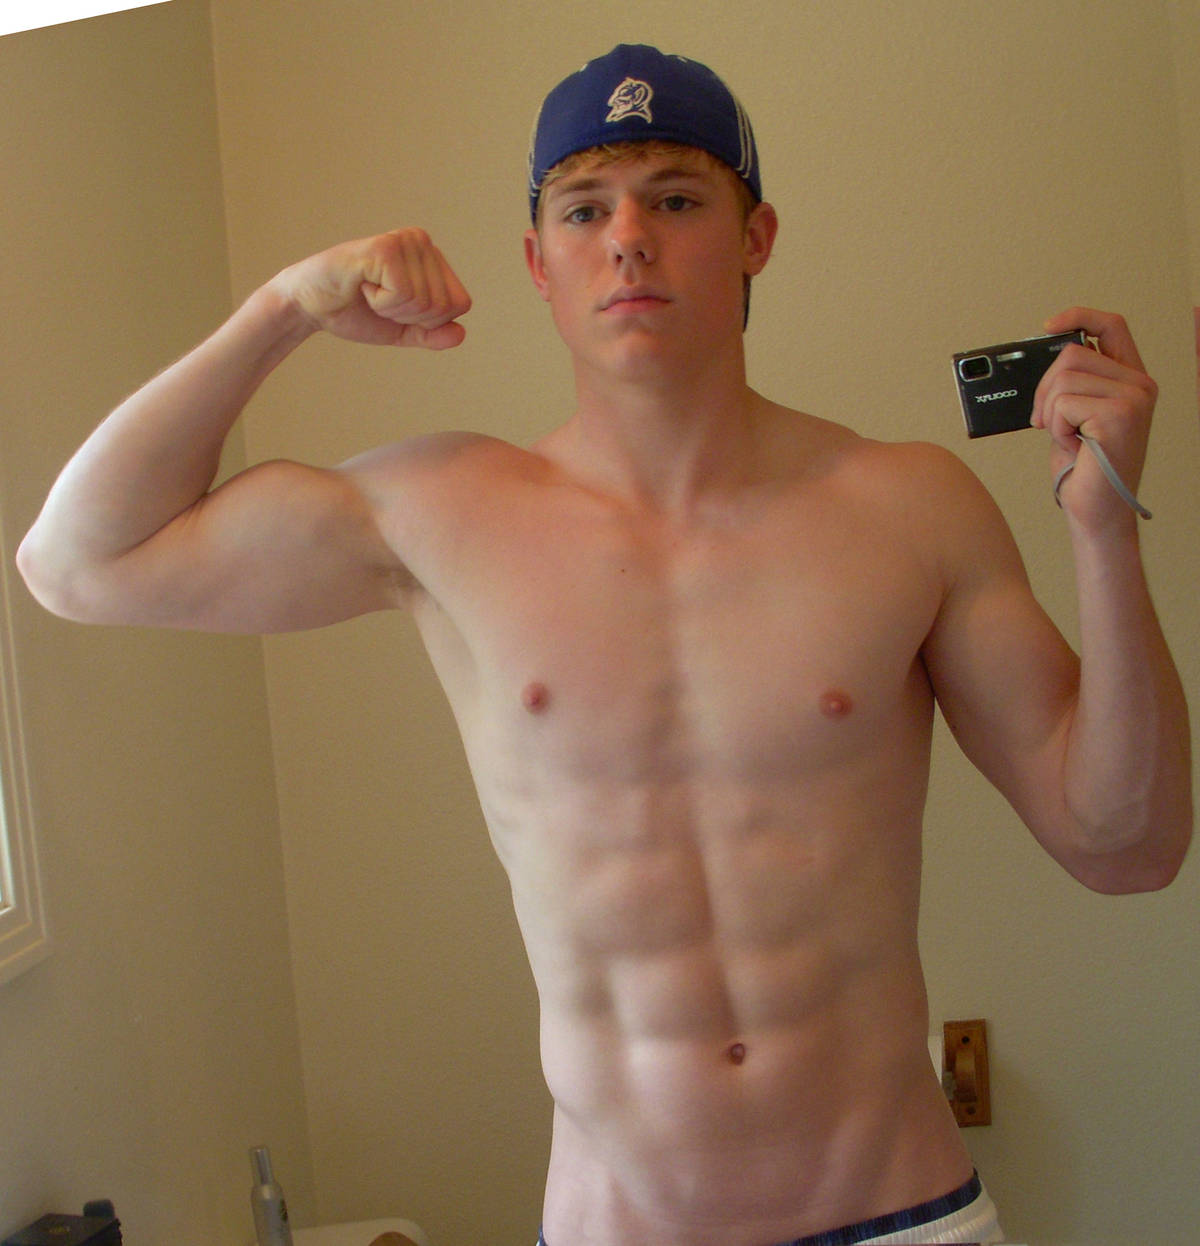 Naked boy russian college boy, honey and yogurt facial